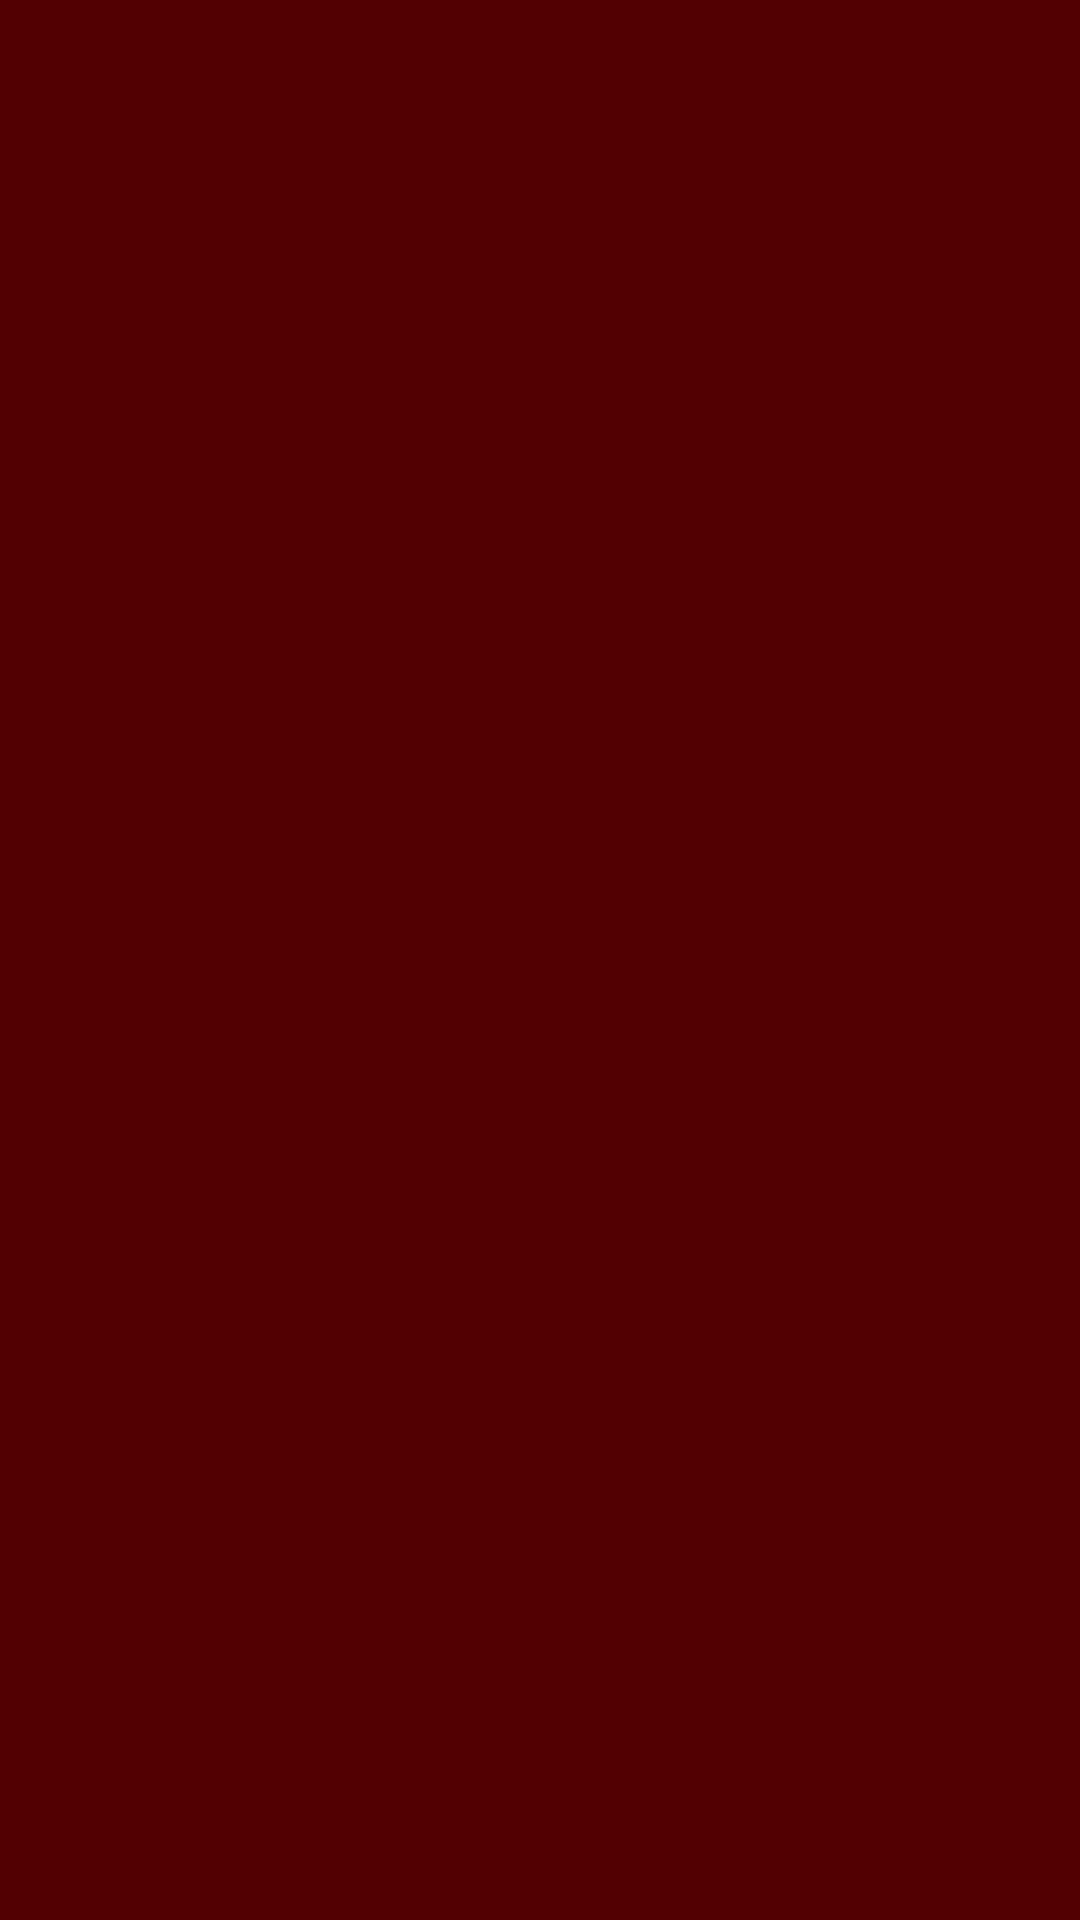 530000 Solid Color Image Https Www Solidcolore Com 530000 Htm Solid Color Wallpaper Back Brown Paint Colors Red Paint Colors Sherwin Williams Paint Colors